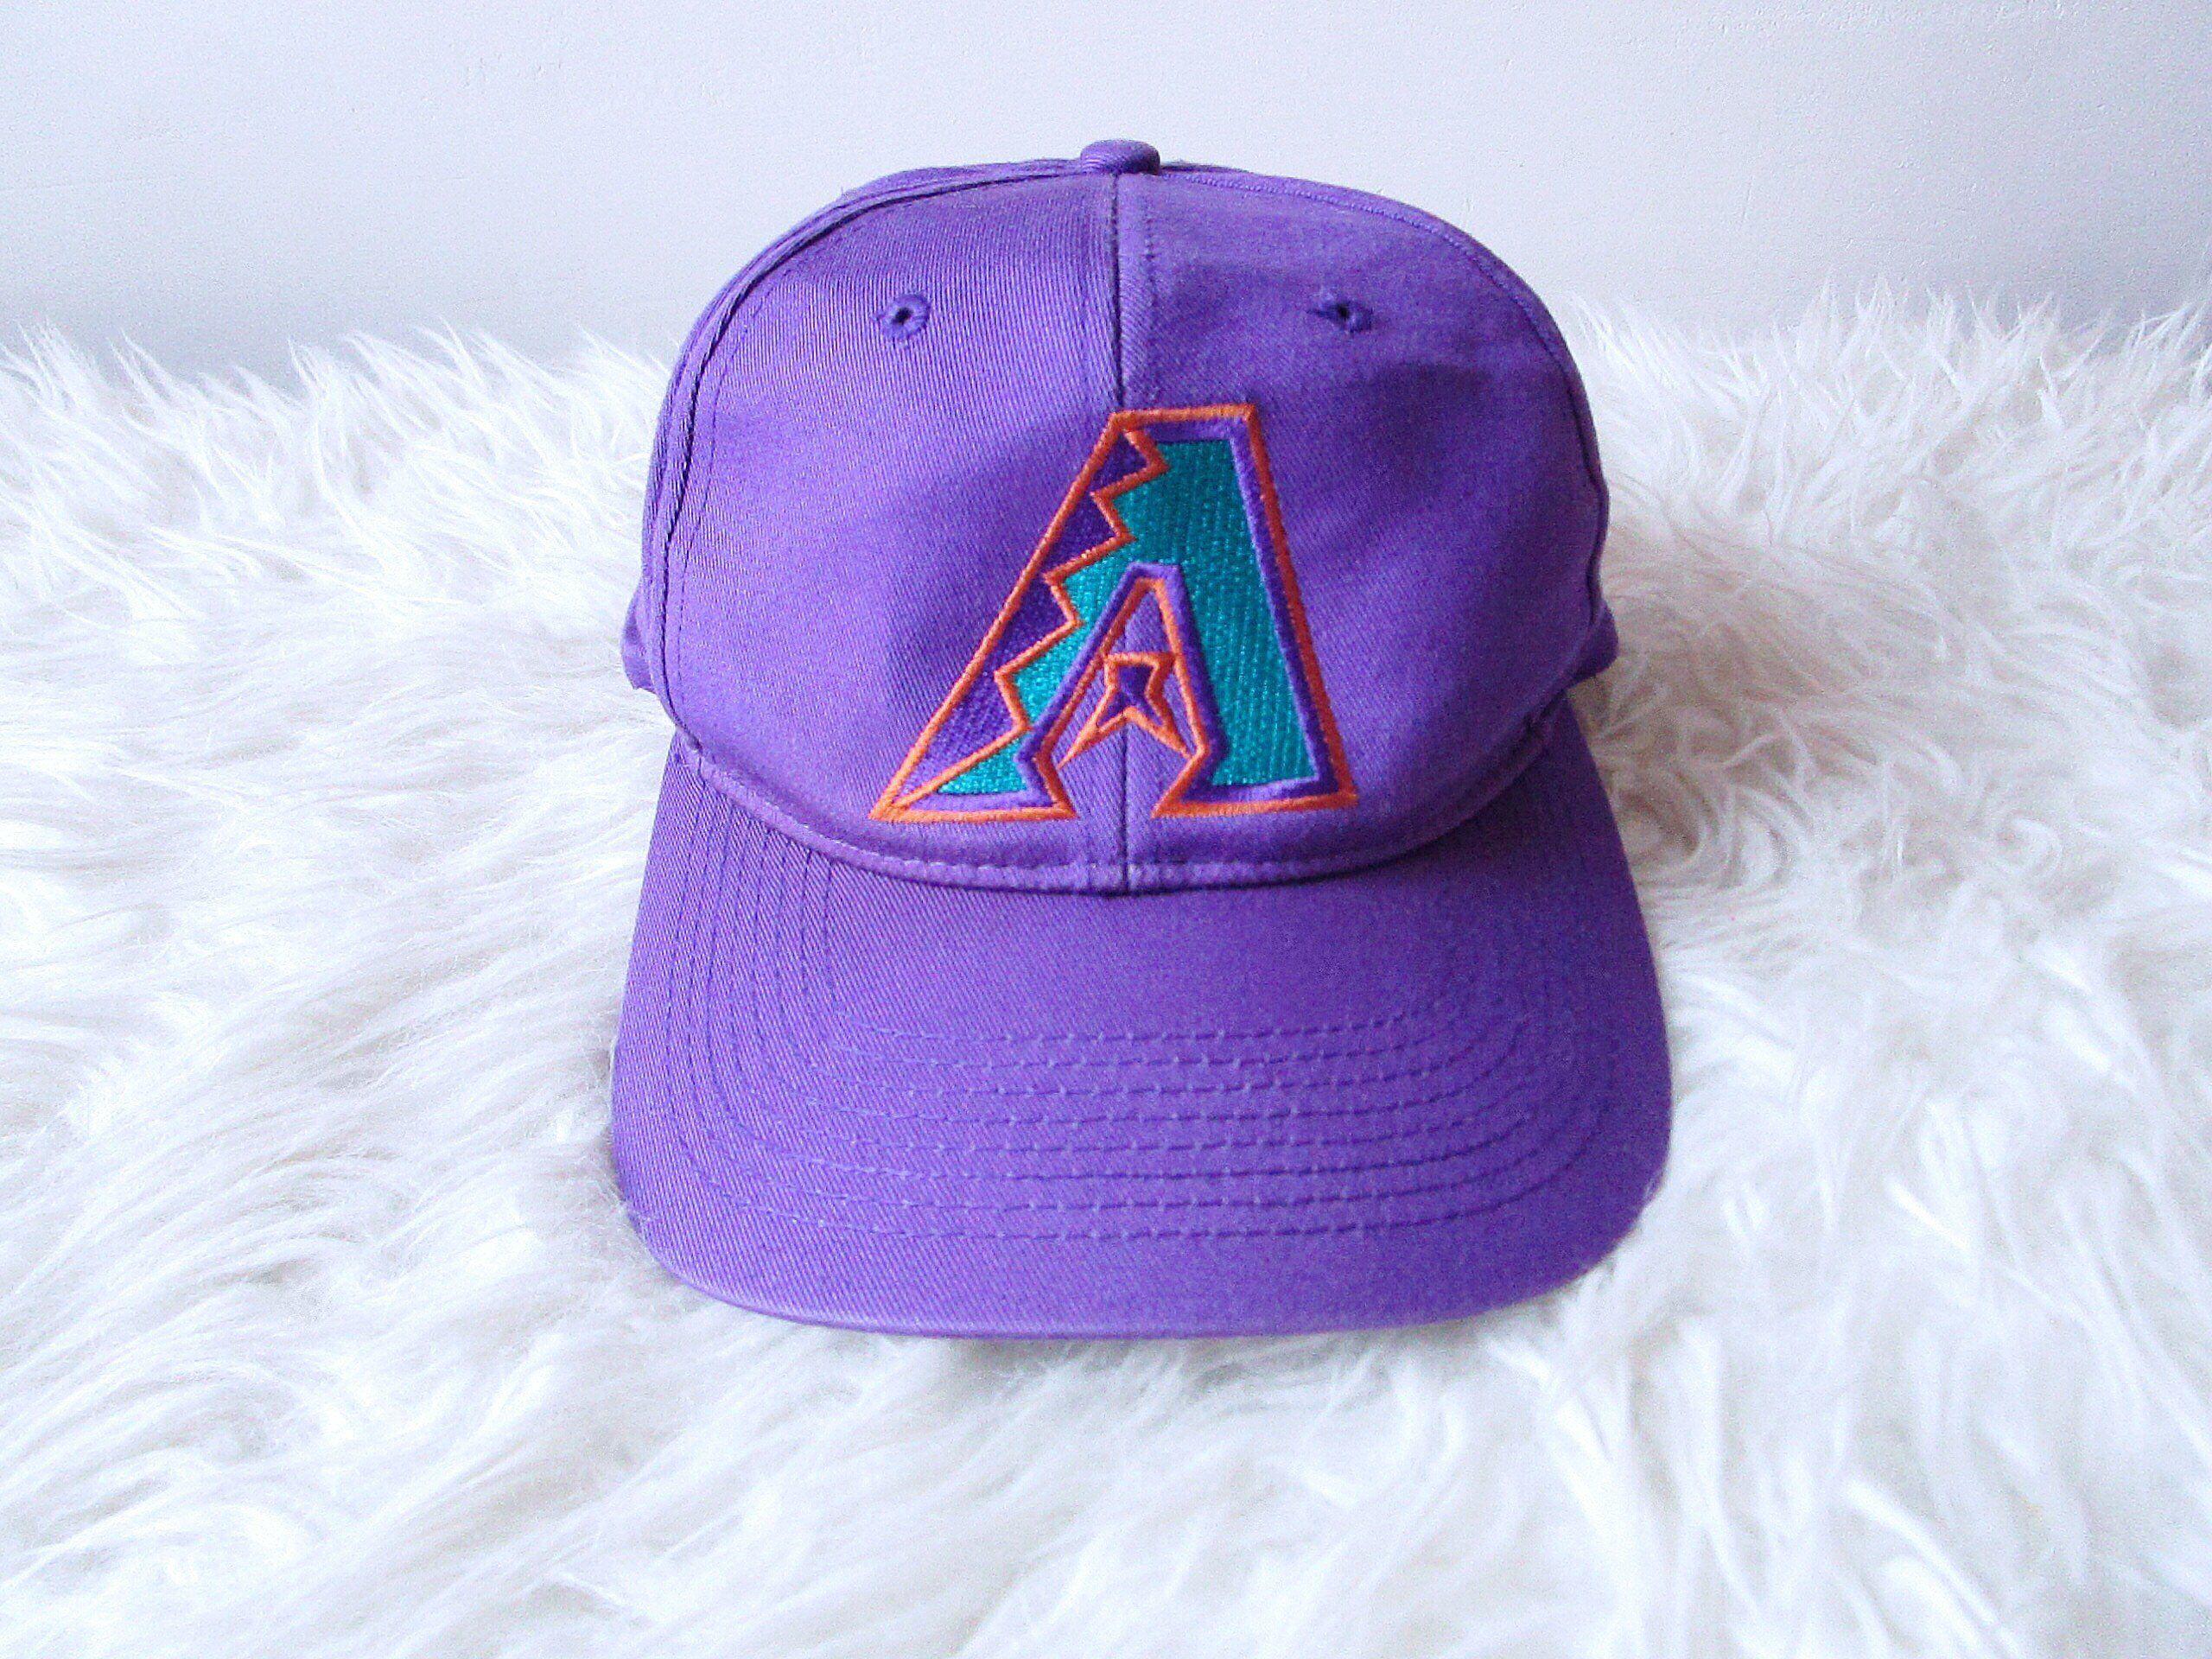 57b8e0a6f Vintage 90's ARIZONA DIAMONDBACKS Baseball Embroidered Adjustable ...